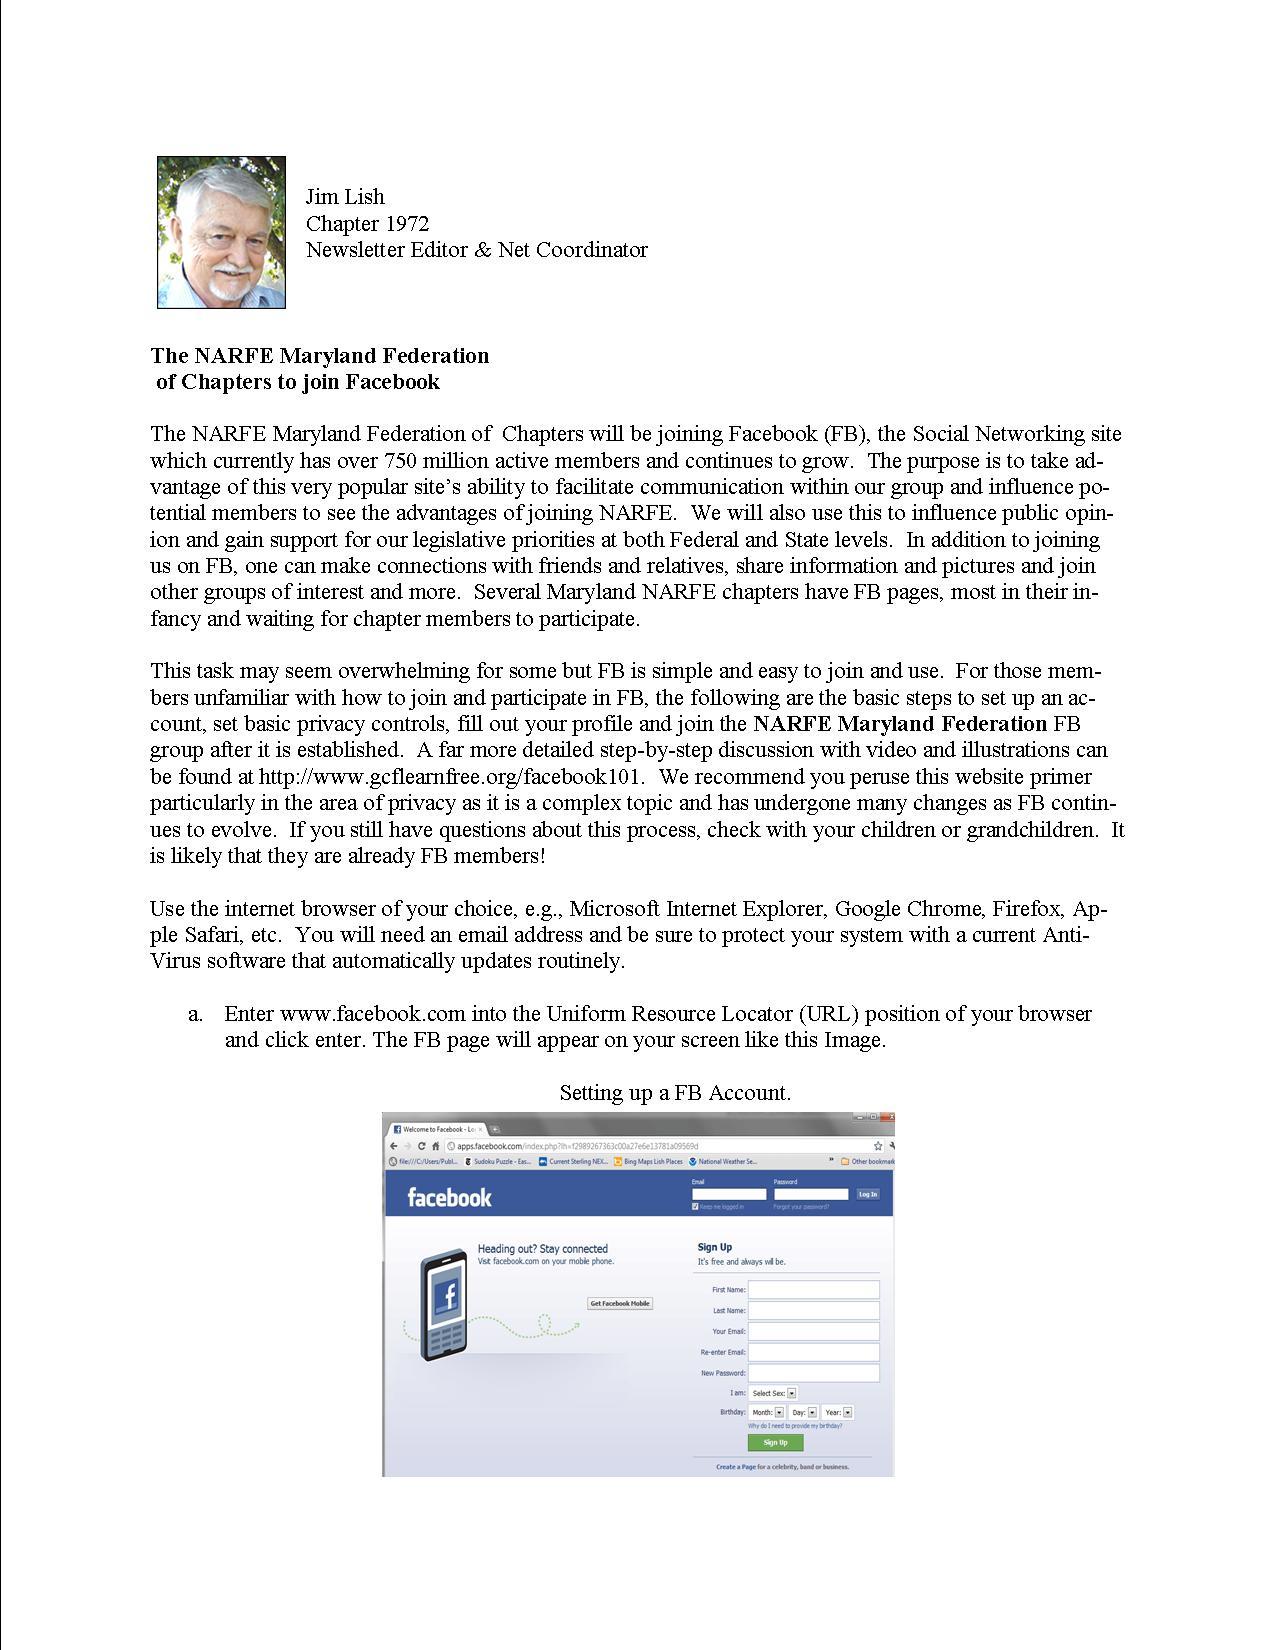 NARFE Maryland Federation FB page